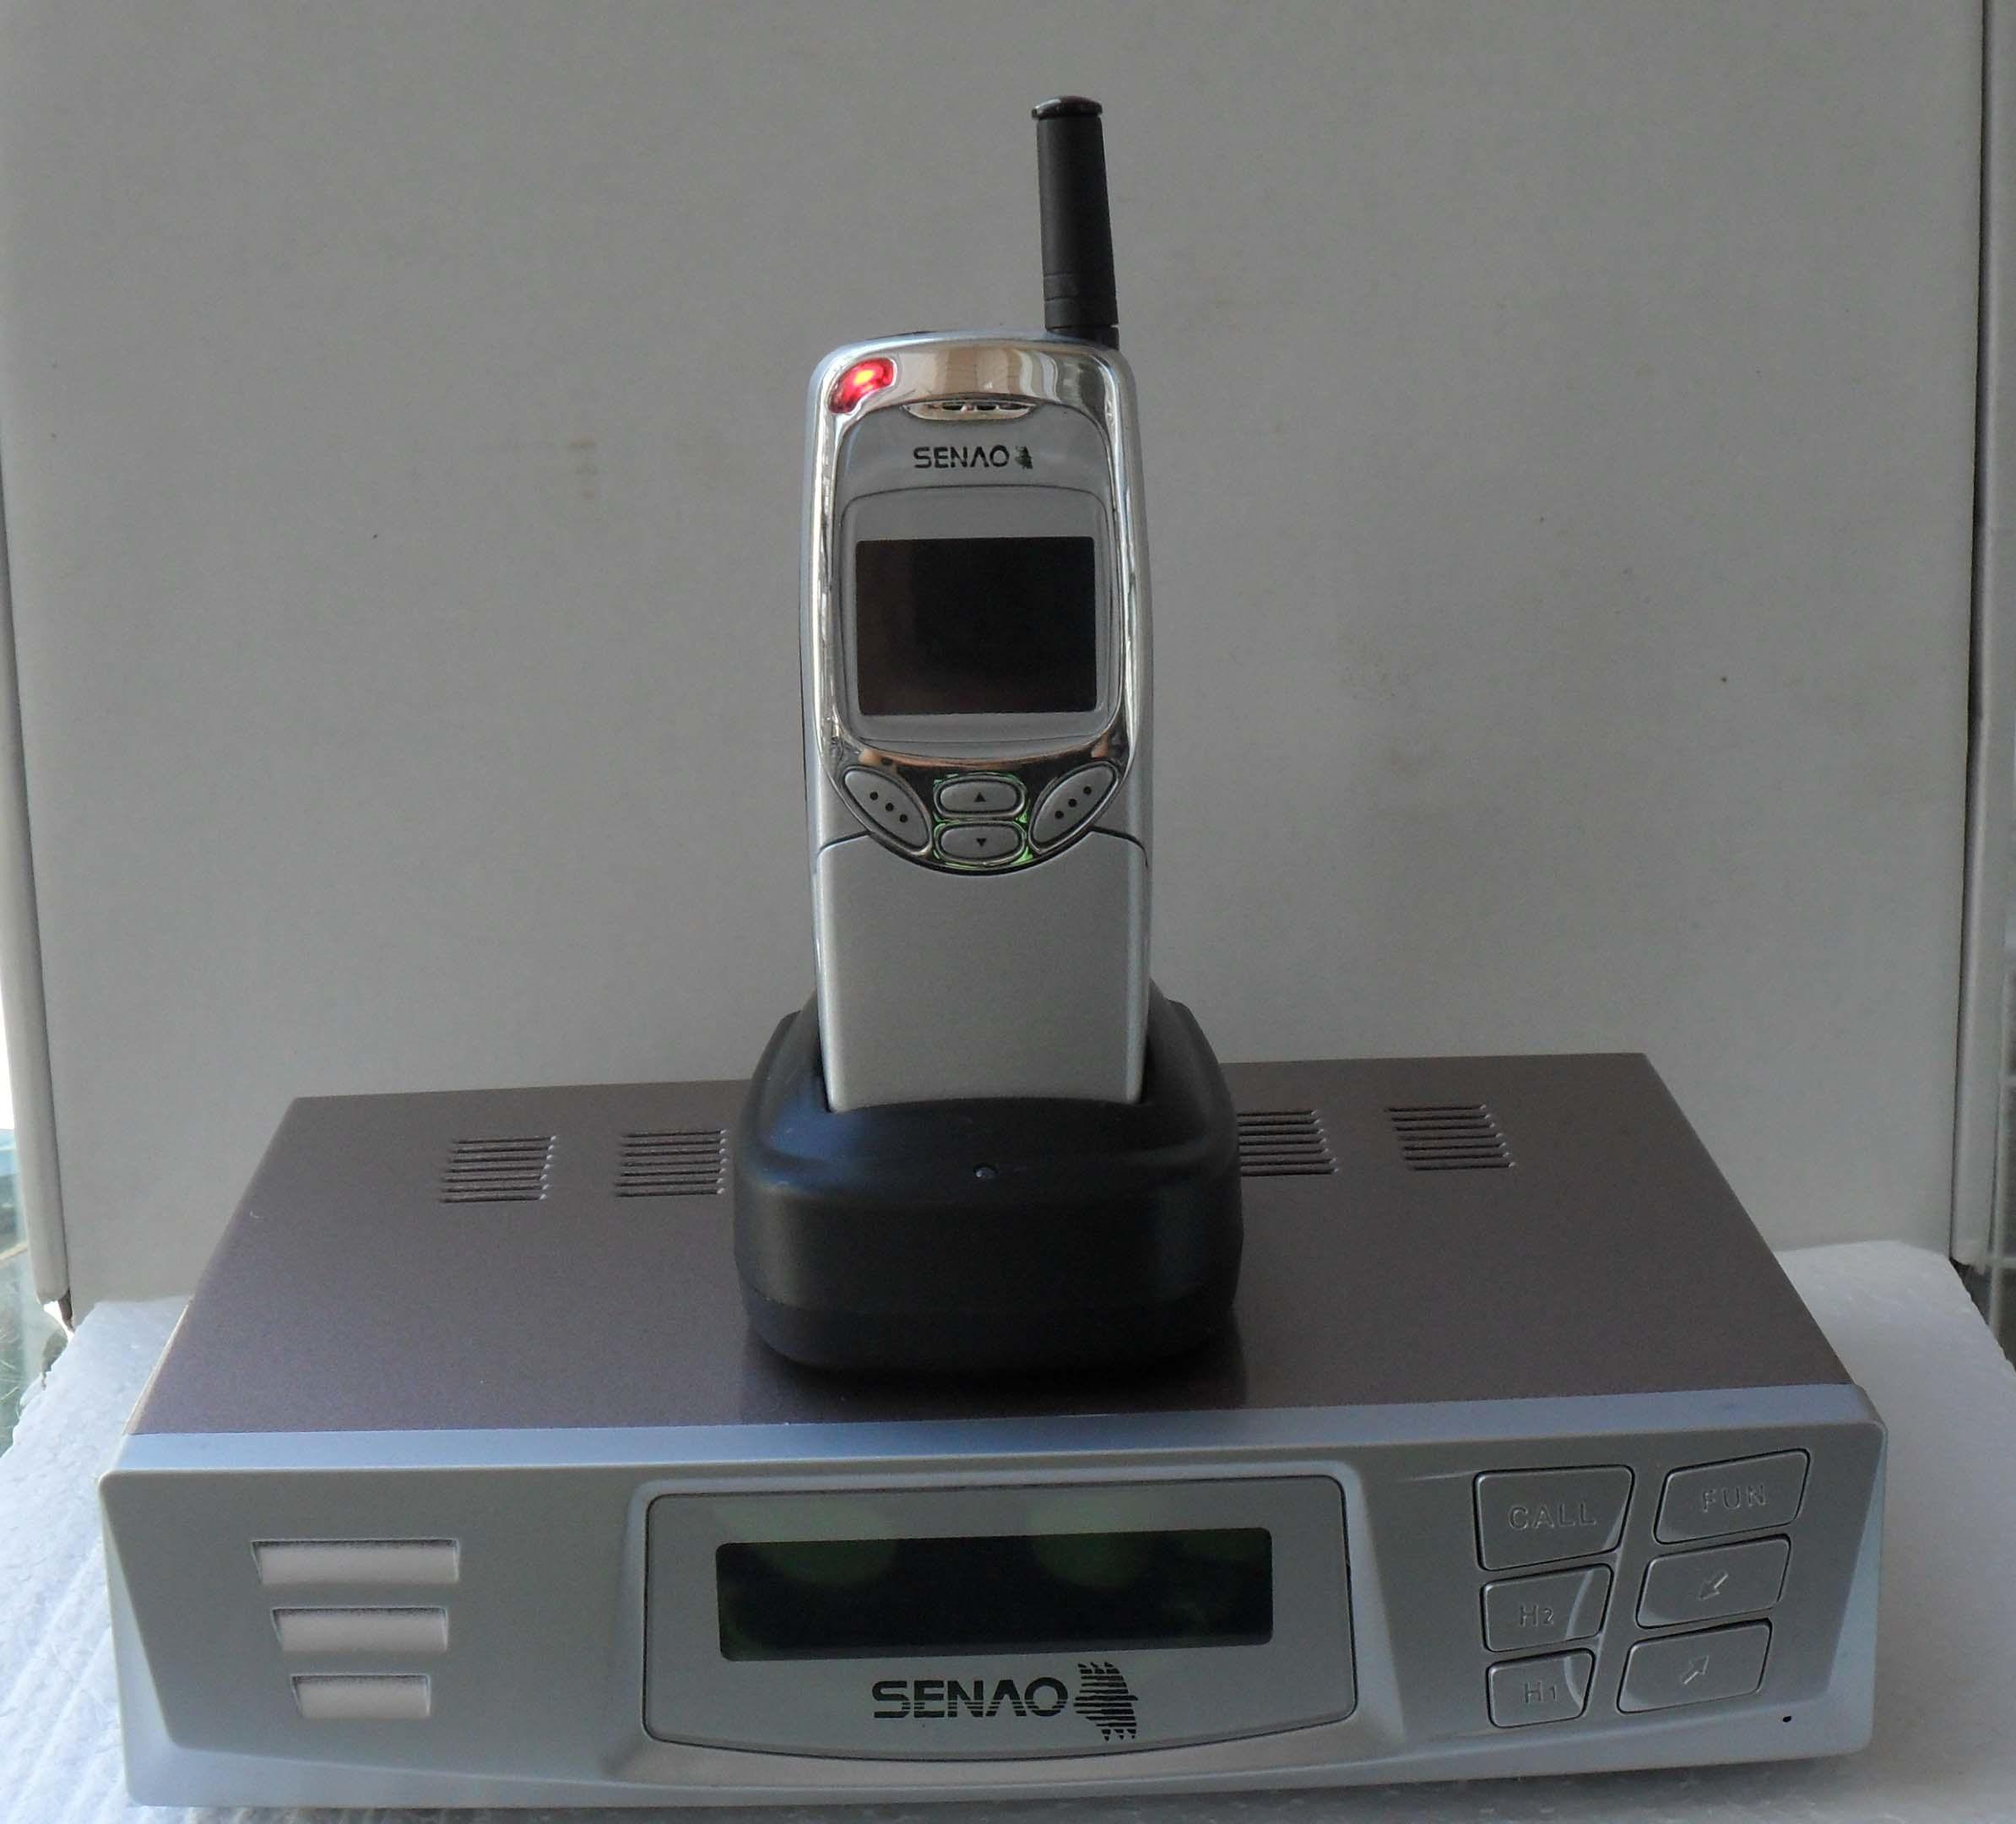 China Senao Sn-629 Long-Range Wireless Telephone - China